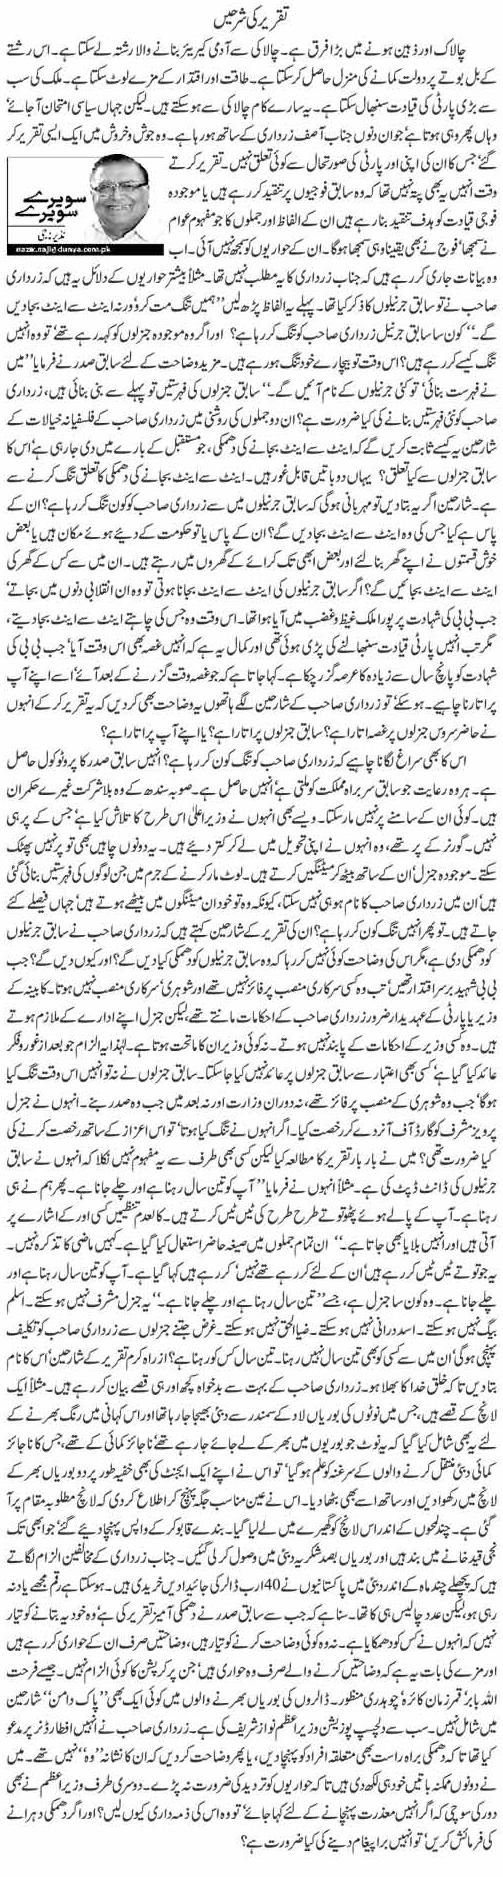 Nazir Naji Column | Taqreer Ki Sharhien | Sawere Sawere